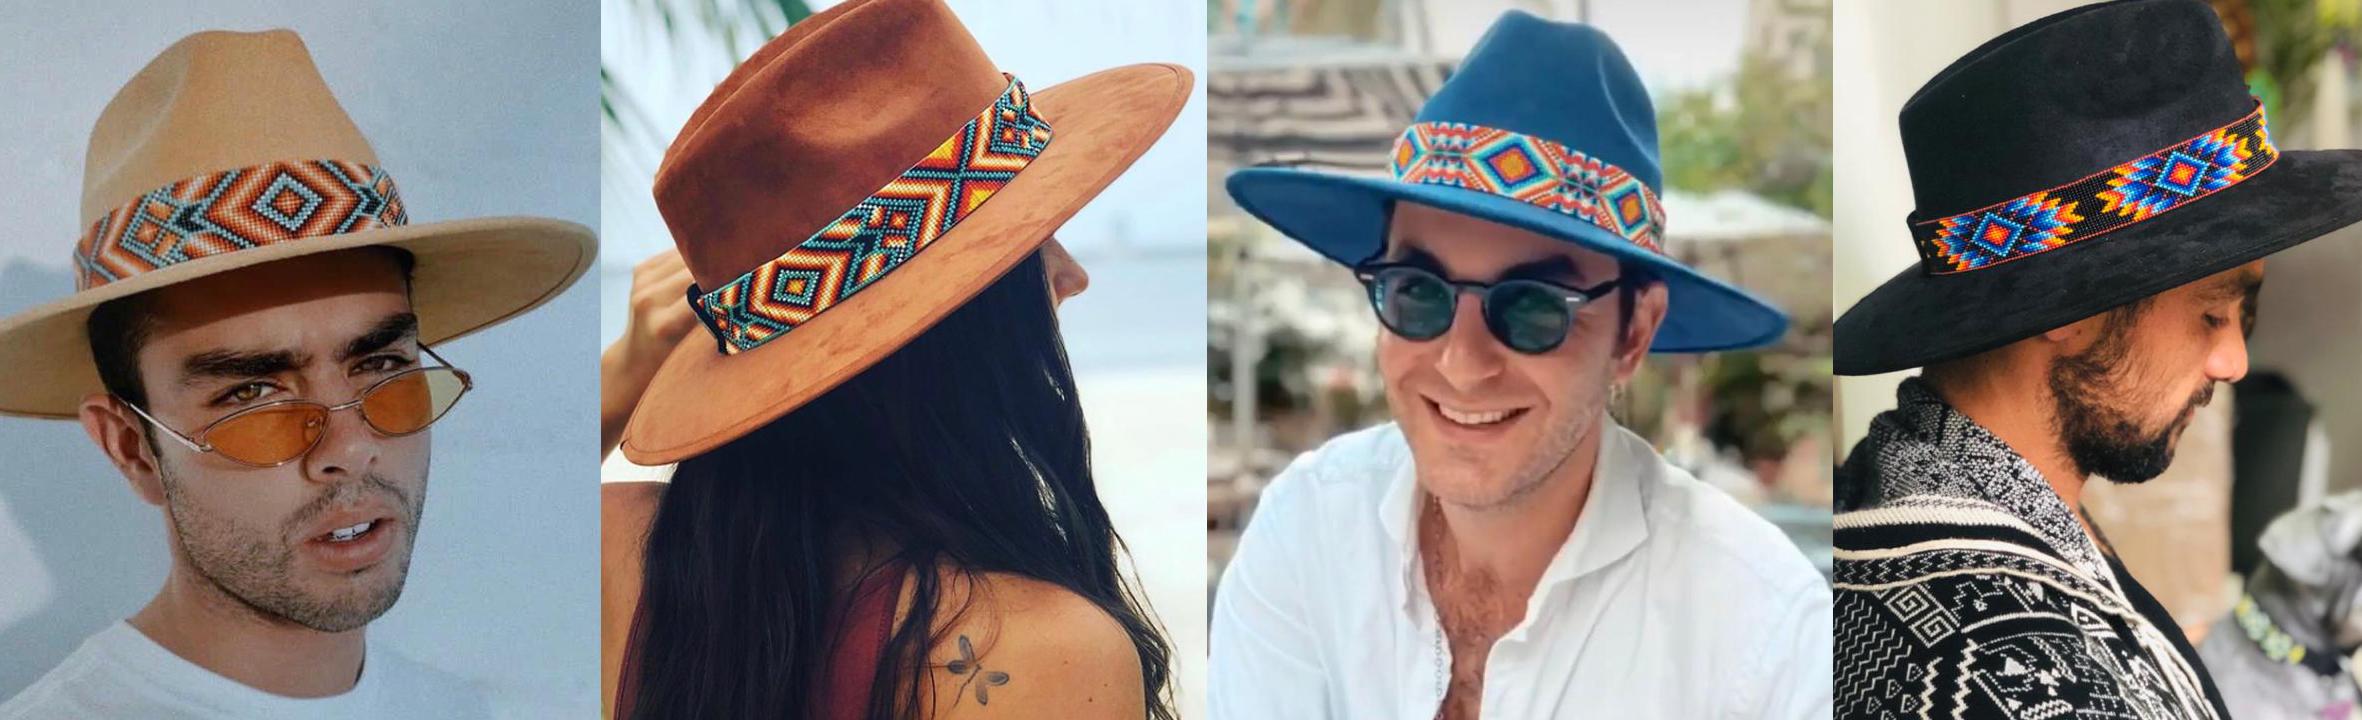 emprendedoras LGBT+ mexicanas Tiari